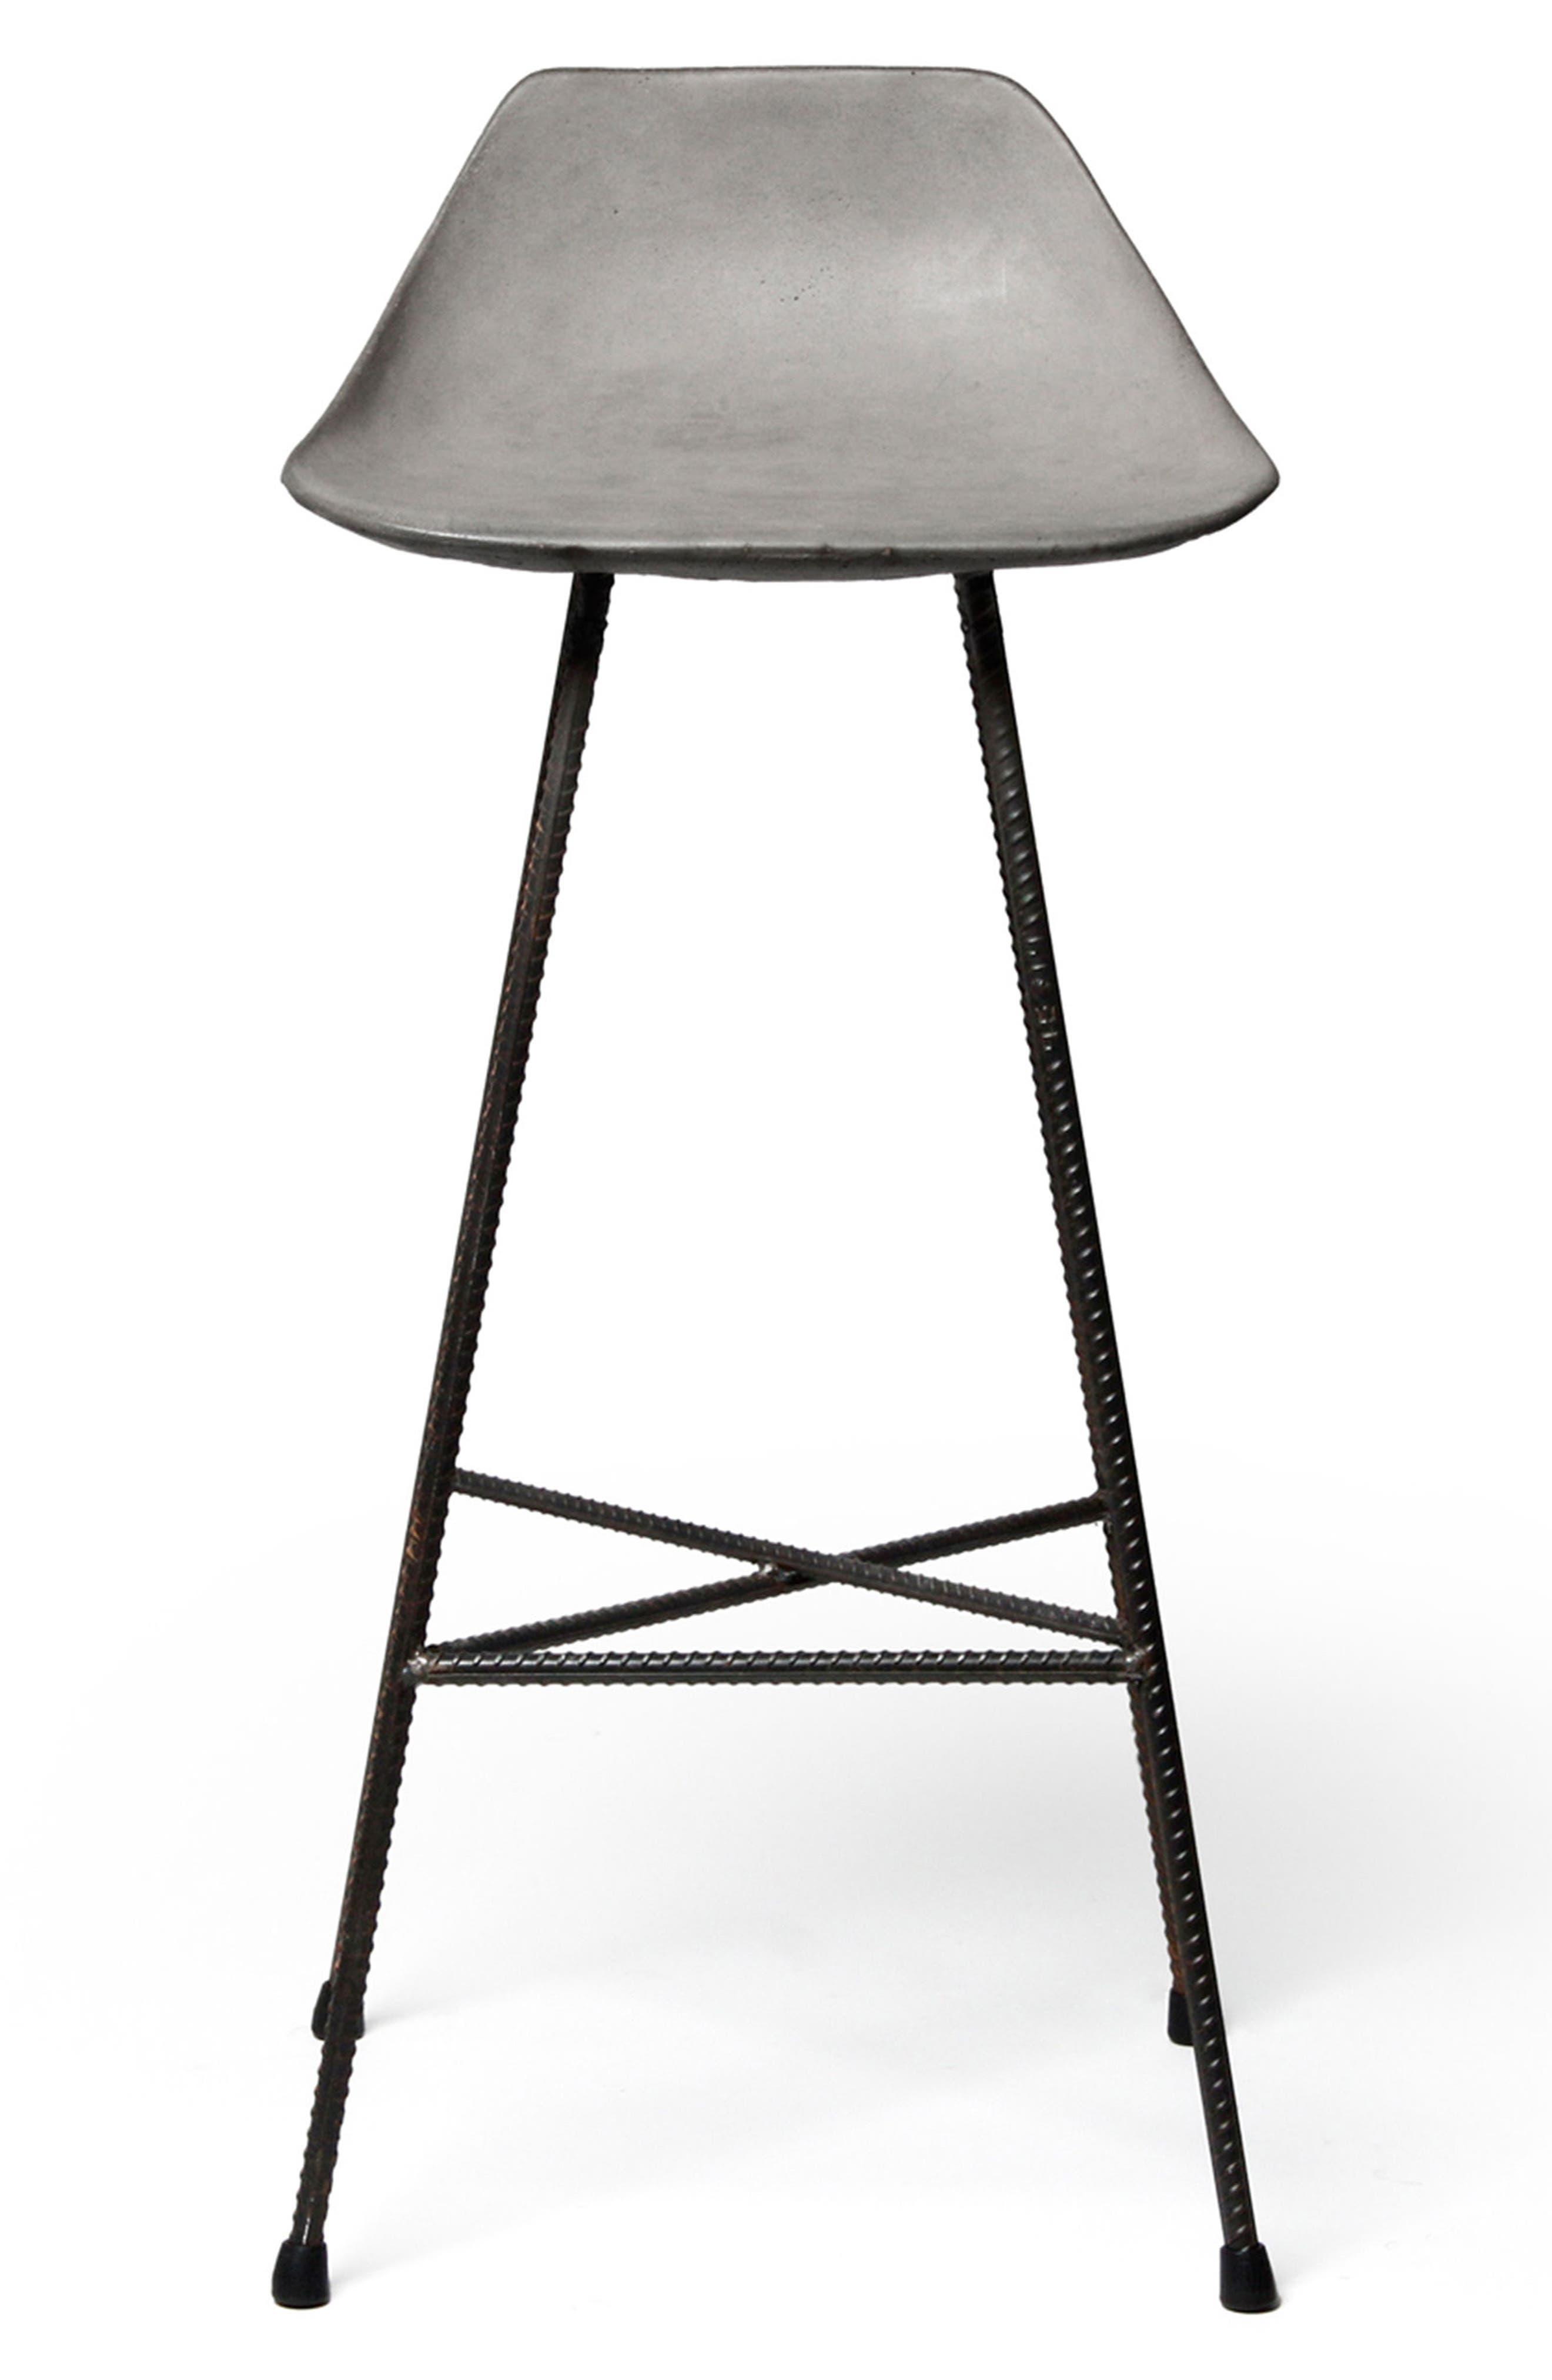 LYON BÉTON,                             Hauteville Bar Chair,                             Main thumbnail 1, color,                             020